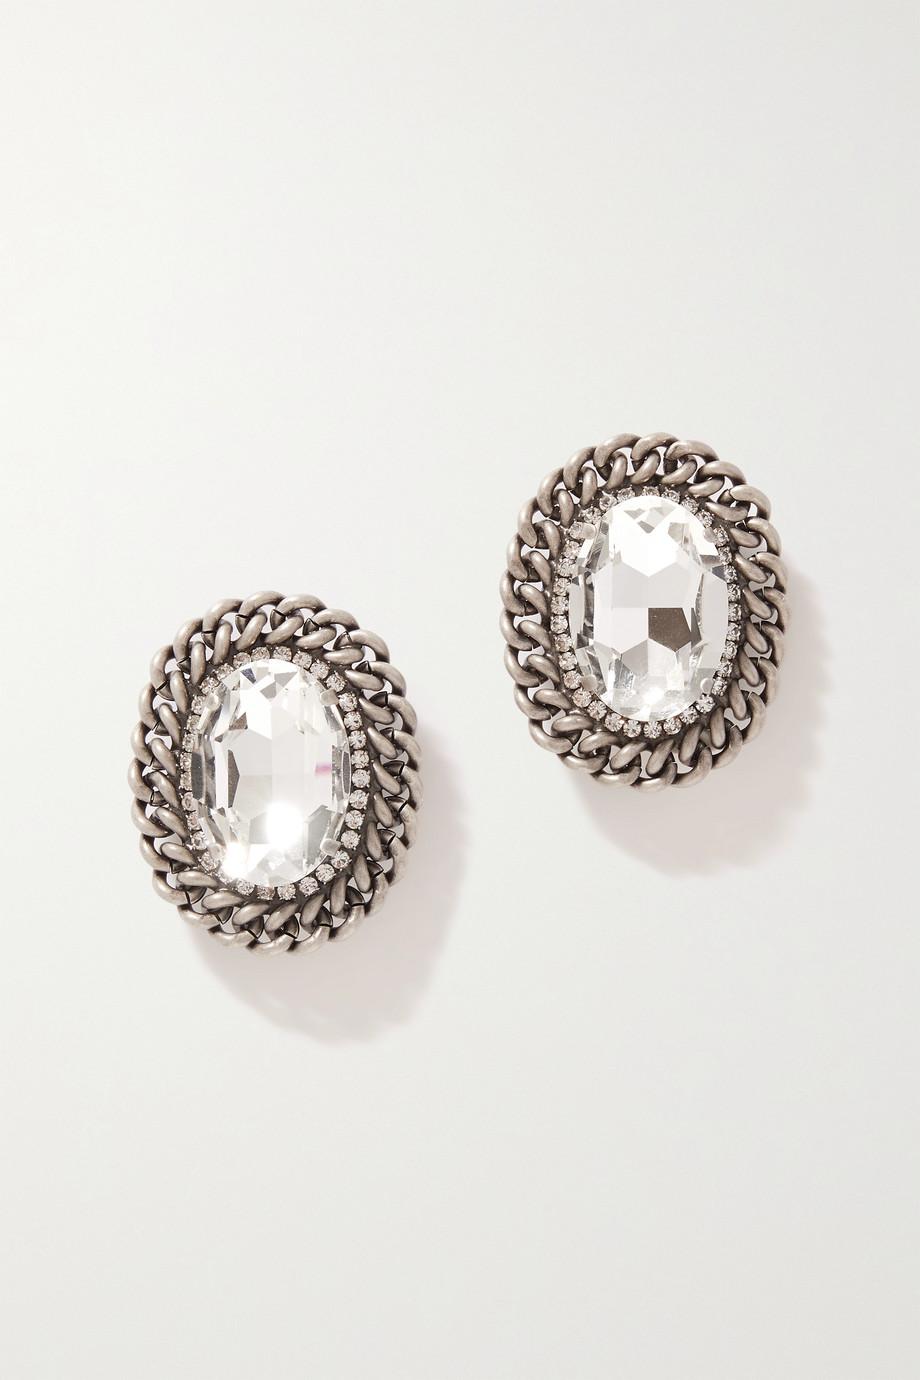 Alessandra Rich Silberfarbene Ohrclips mit Kristallen